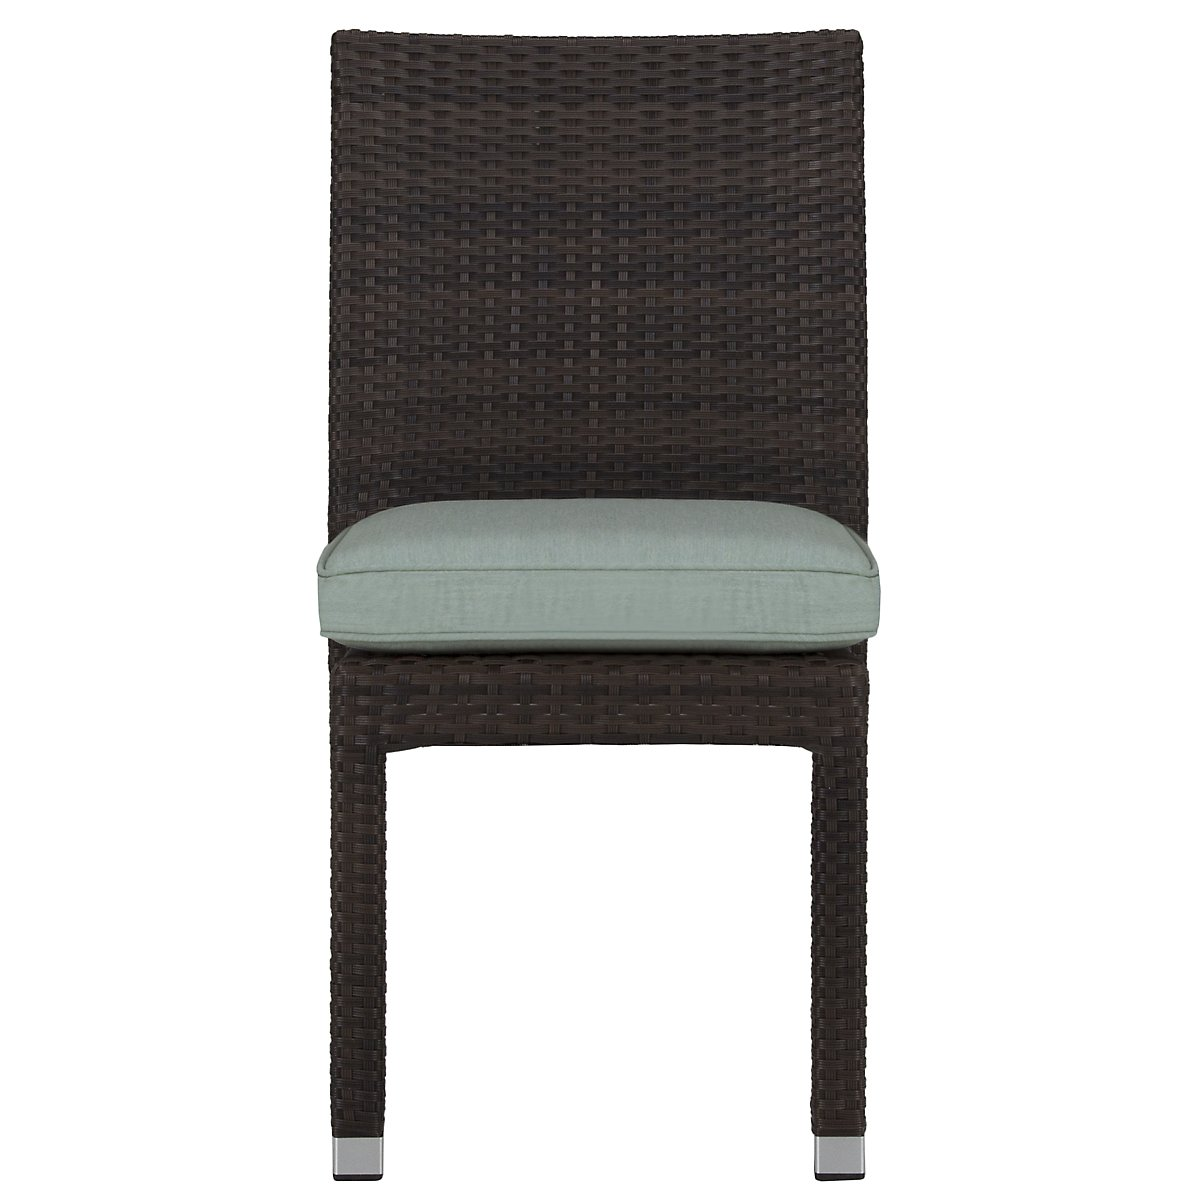 City Furniture Zen Teal 84 Rectangular Table 4 Chairs